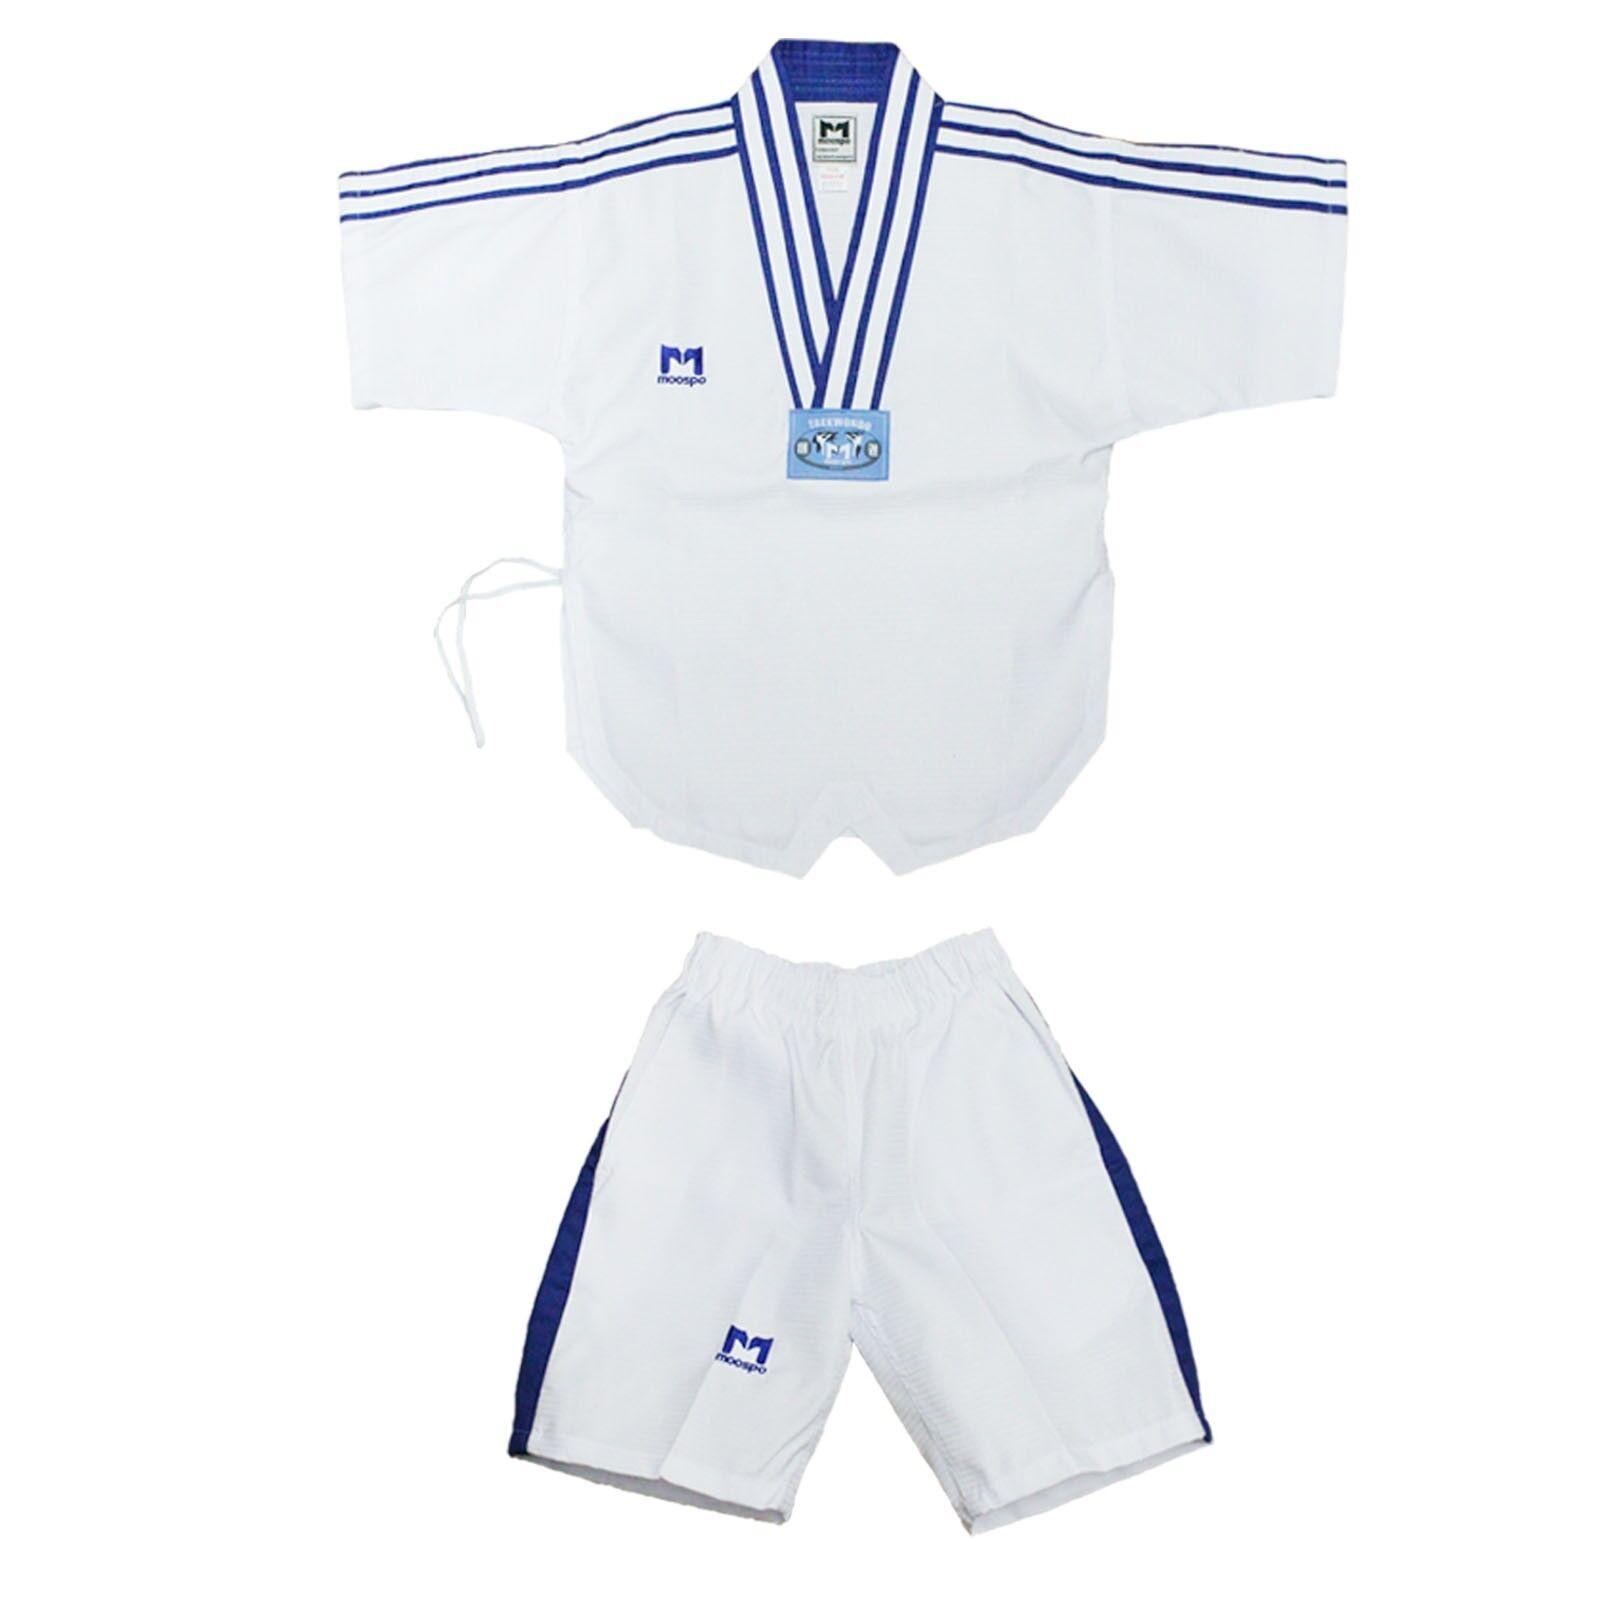 TAEKWONDO SUMMER UNIFORM Dobok Suits bluee Stripes Diamond Pattern Cool MMA TKD